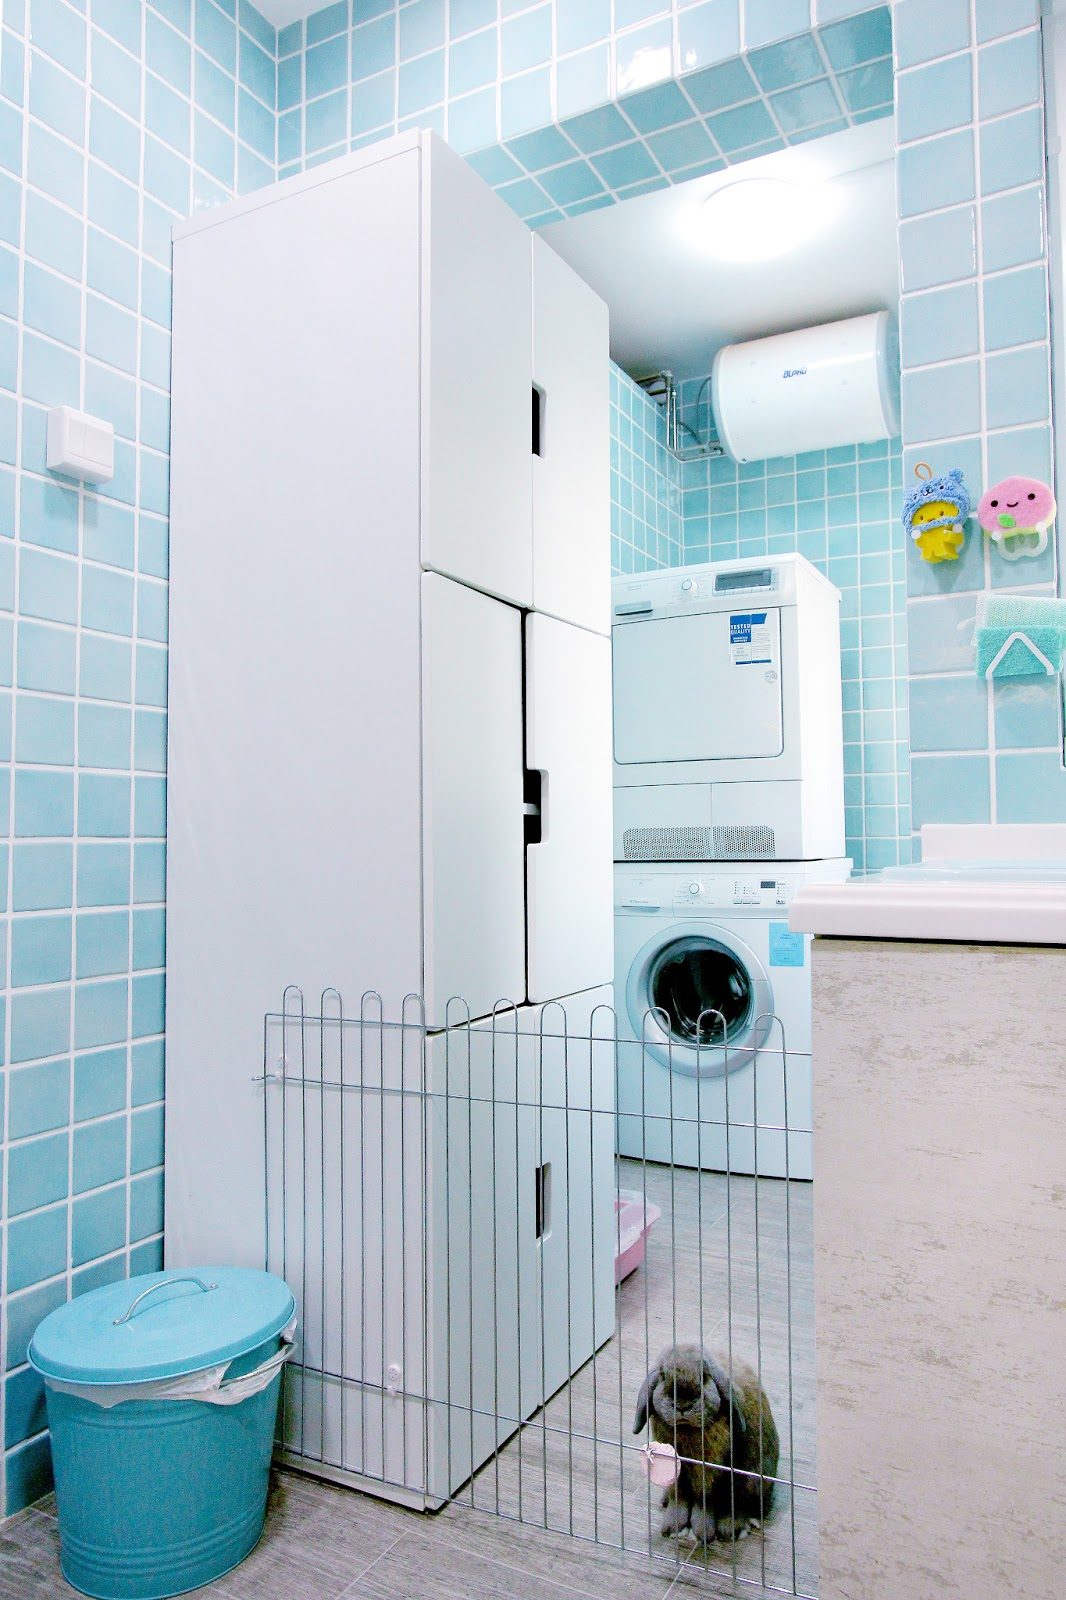 Carpenter Kitchen Cabinet Unusual Gadgets Xiaxue.blogspot.com - Everyone's Reading It.: Home Decor ...